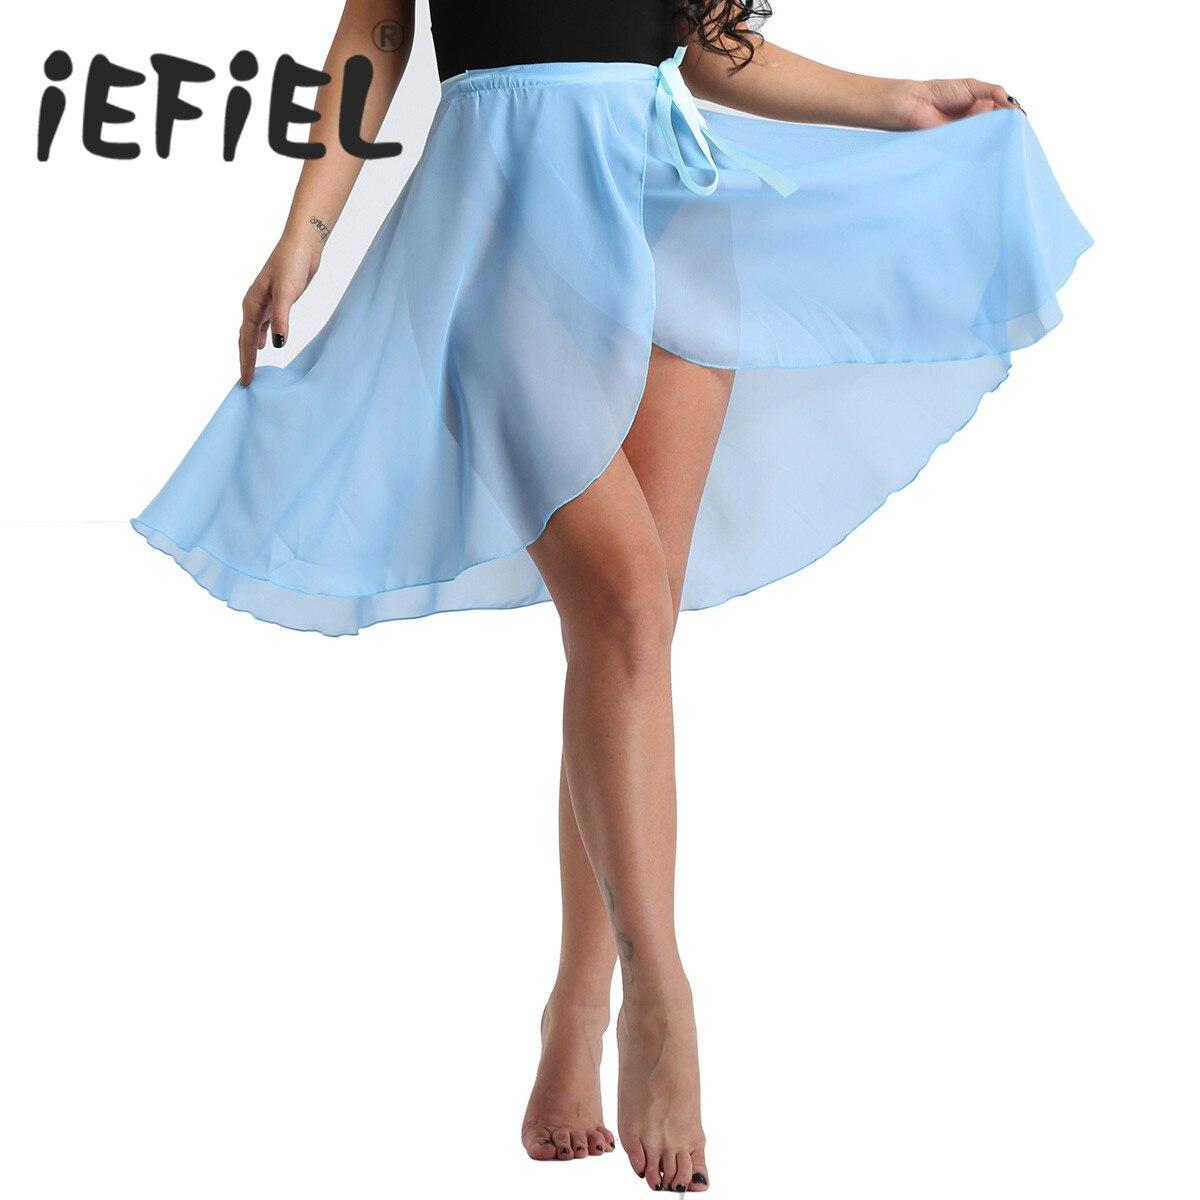 New Arrival Women Fashion Chiffon Wrap Over Scarf Ballet Skirt With Waist Tie Ballet Dance Adult Performance Costume Dance Skirt